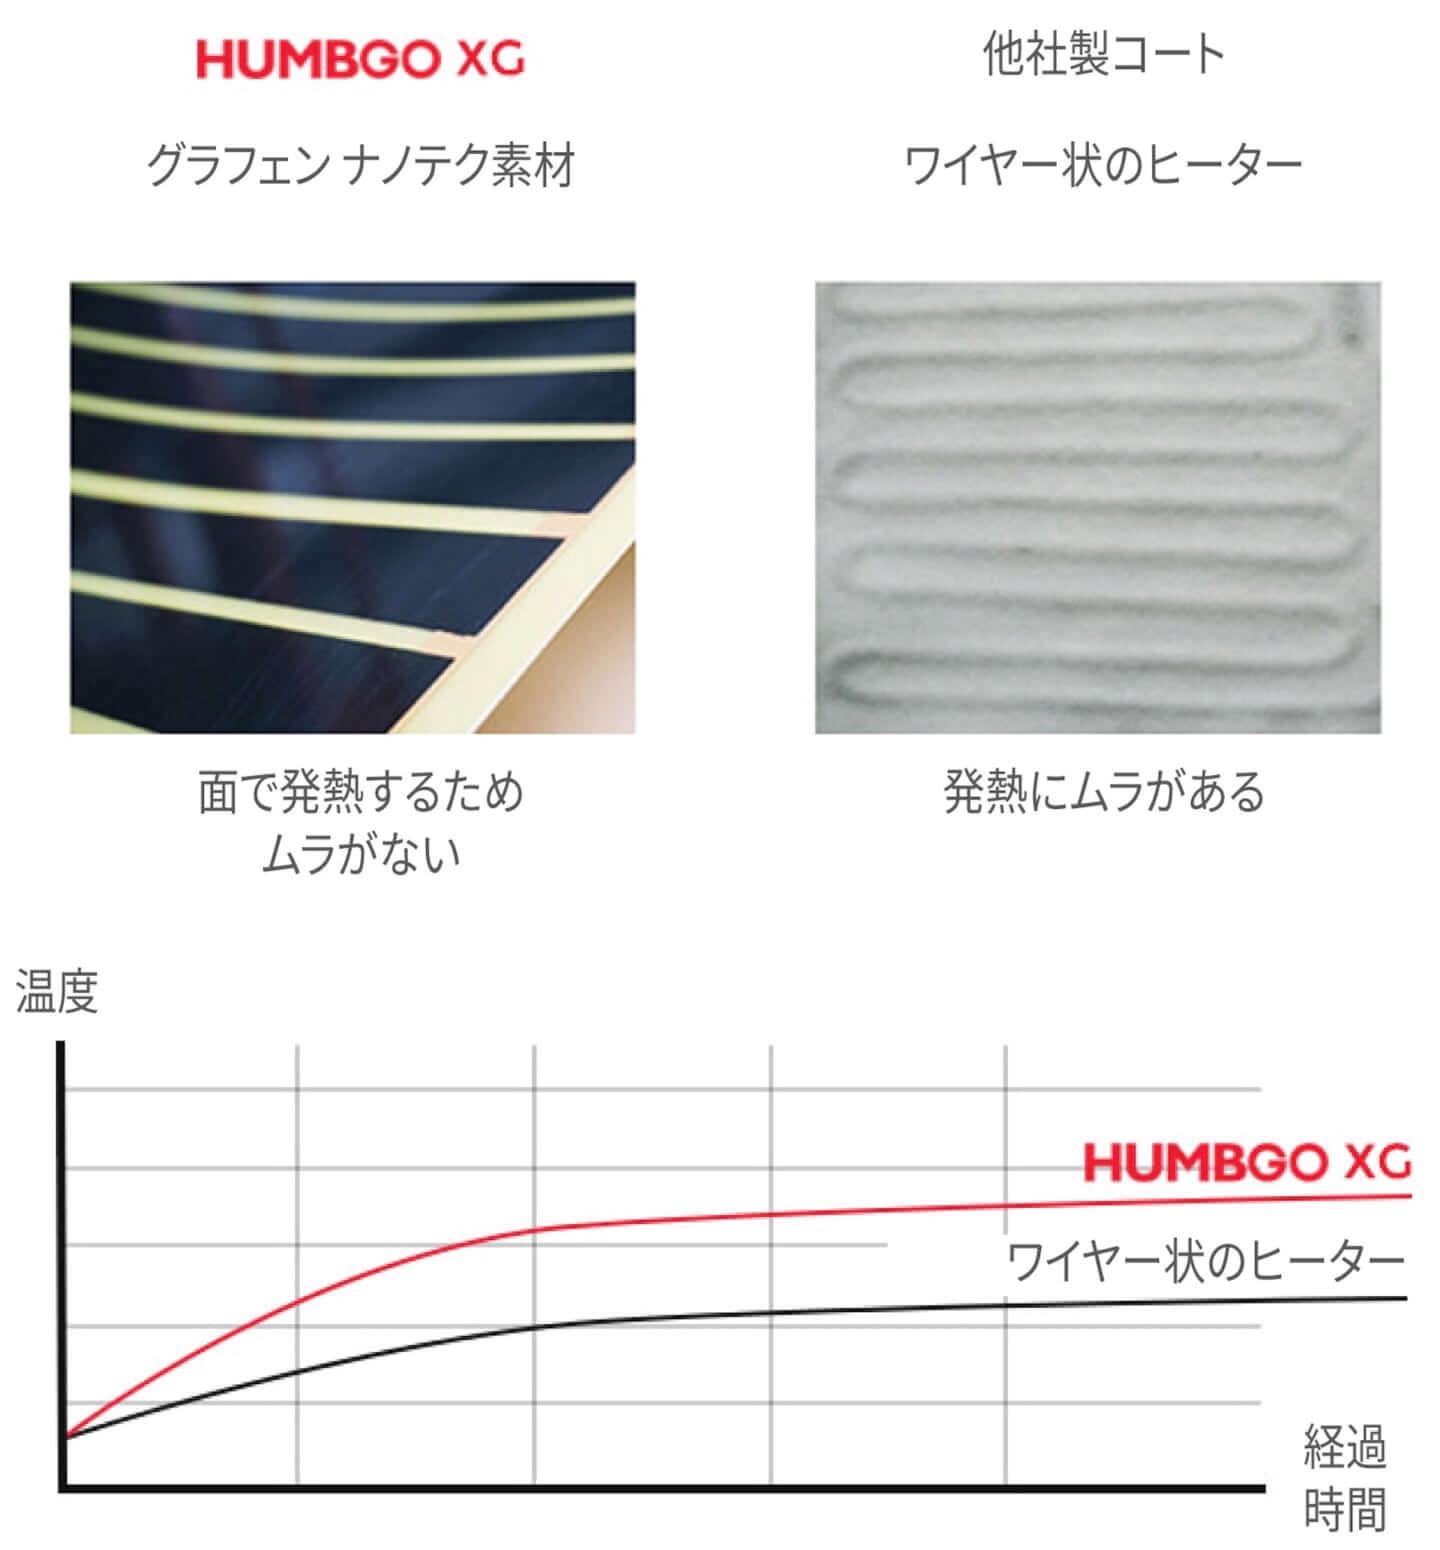 USB電源で発熱、どんな天候でも快適に過ごせる「Humbgo XG ヒートジャケット」が登場 sub7-1440x1550